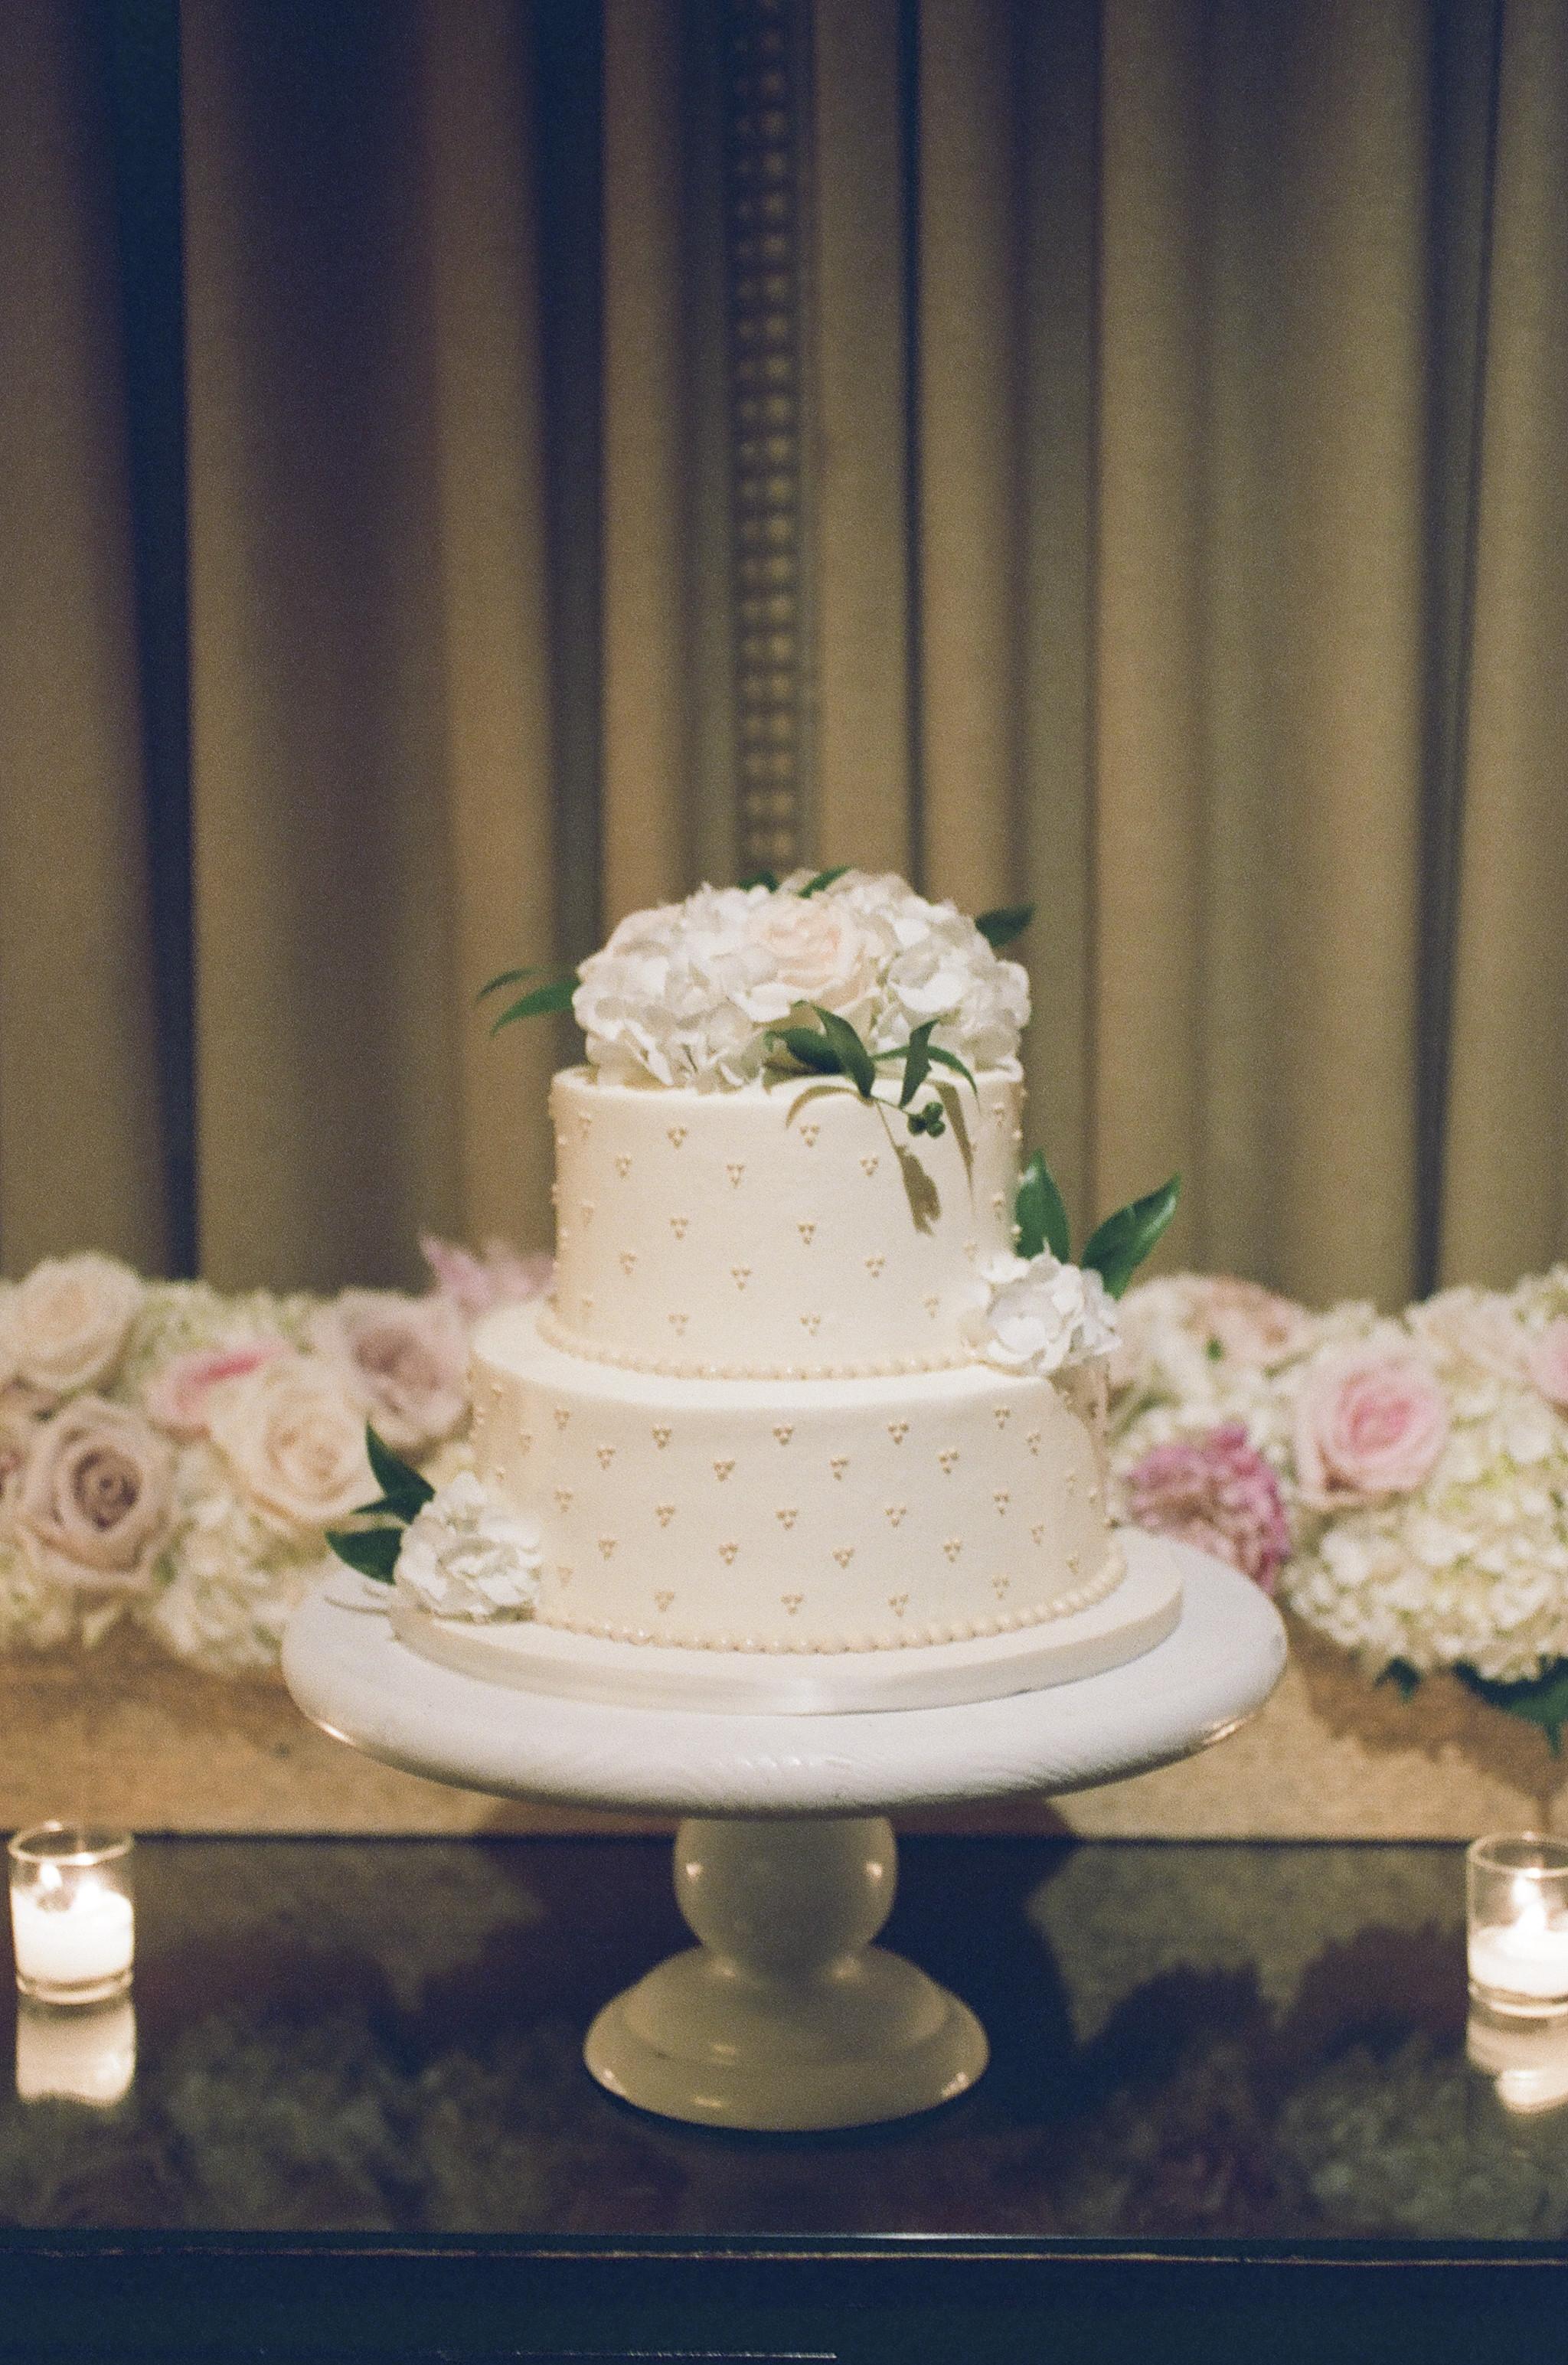 Wedding Cakes 2 Tier  Two Tier Wedding Cake Elizabeth Anne Designs The